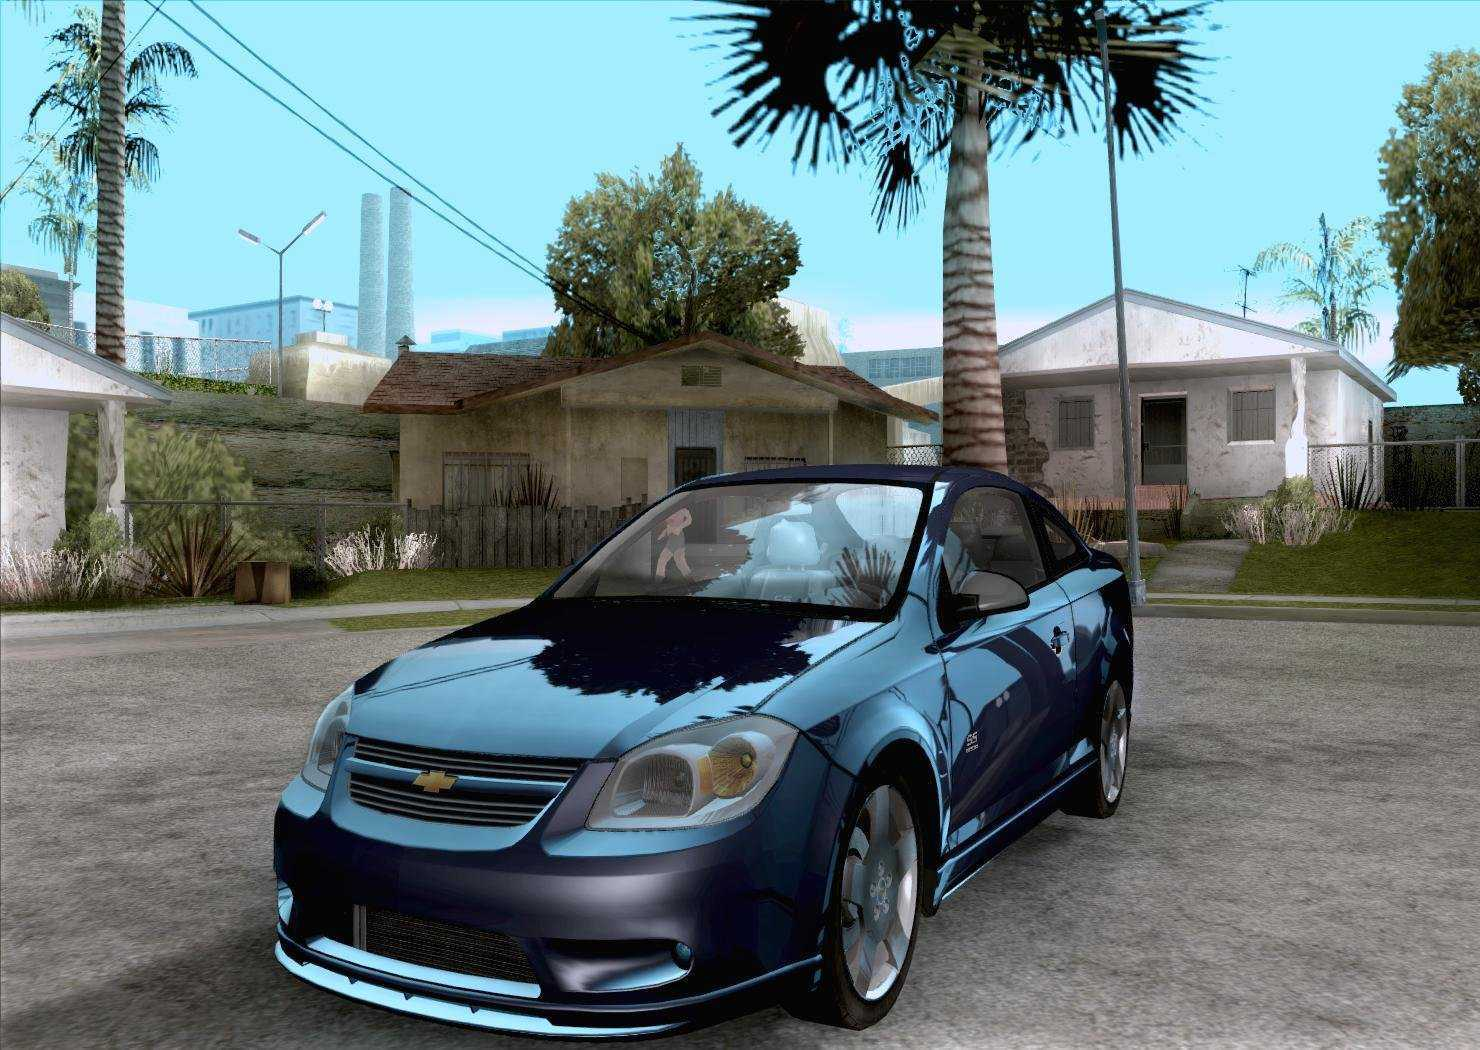 Chevrolet Cobalt SS Modification - Car Modification